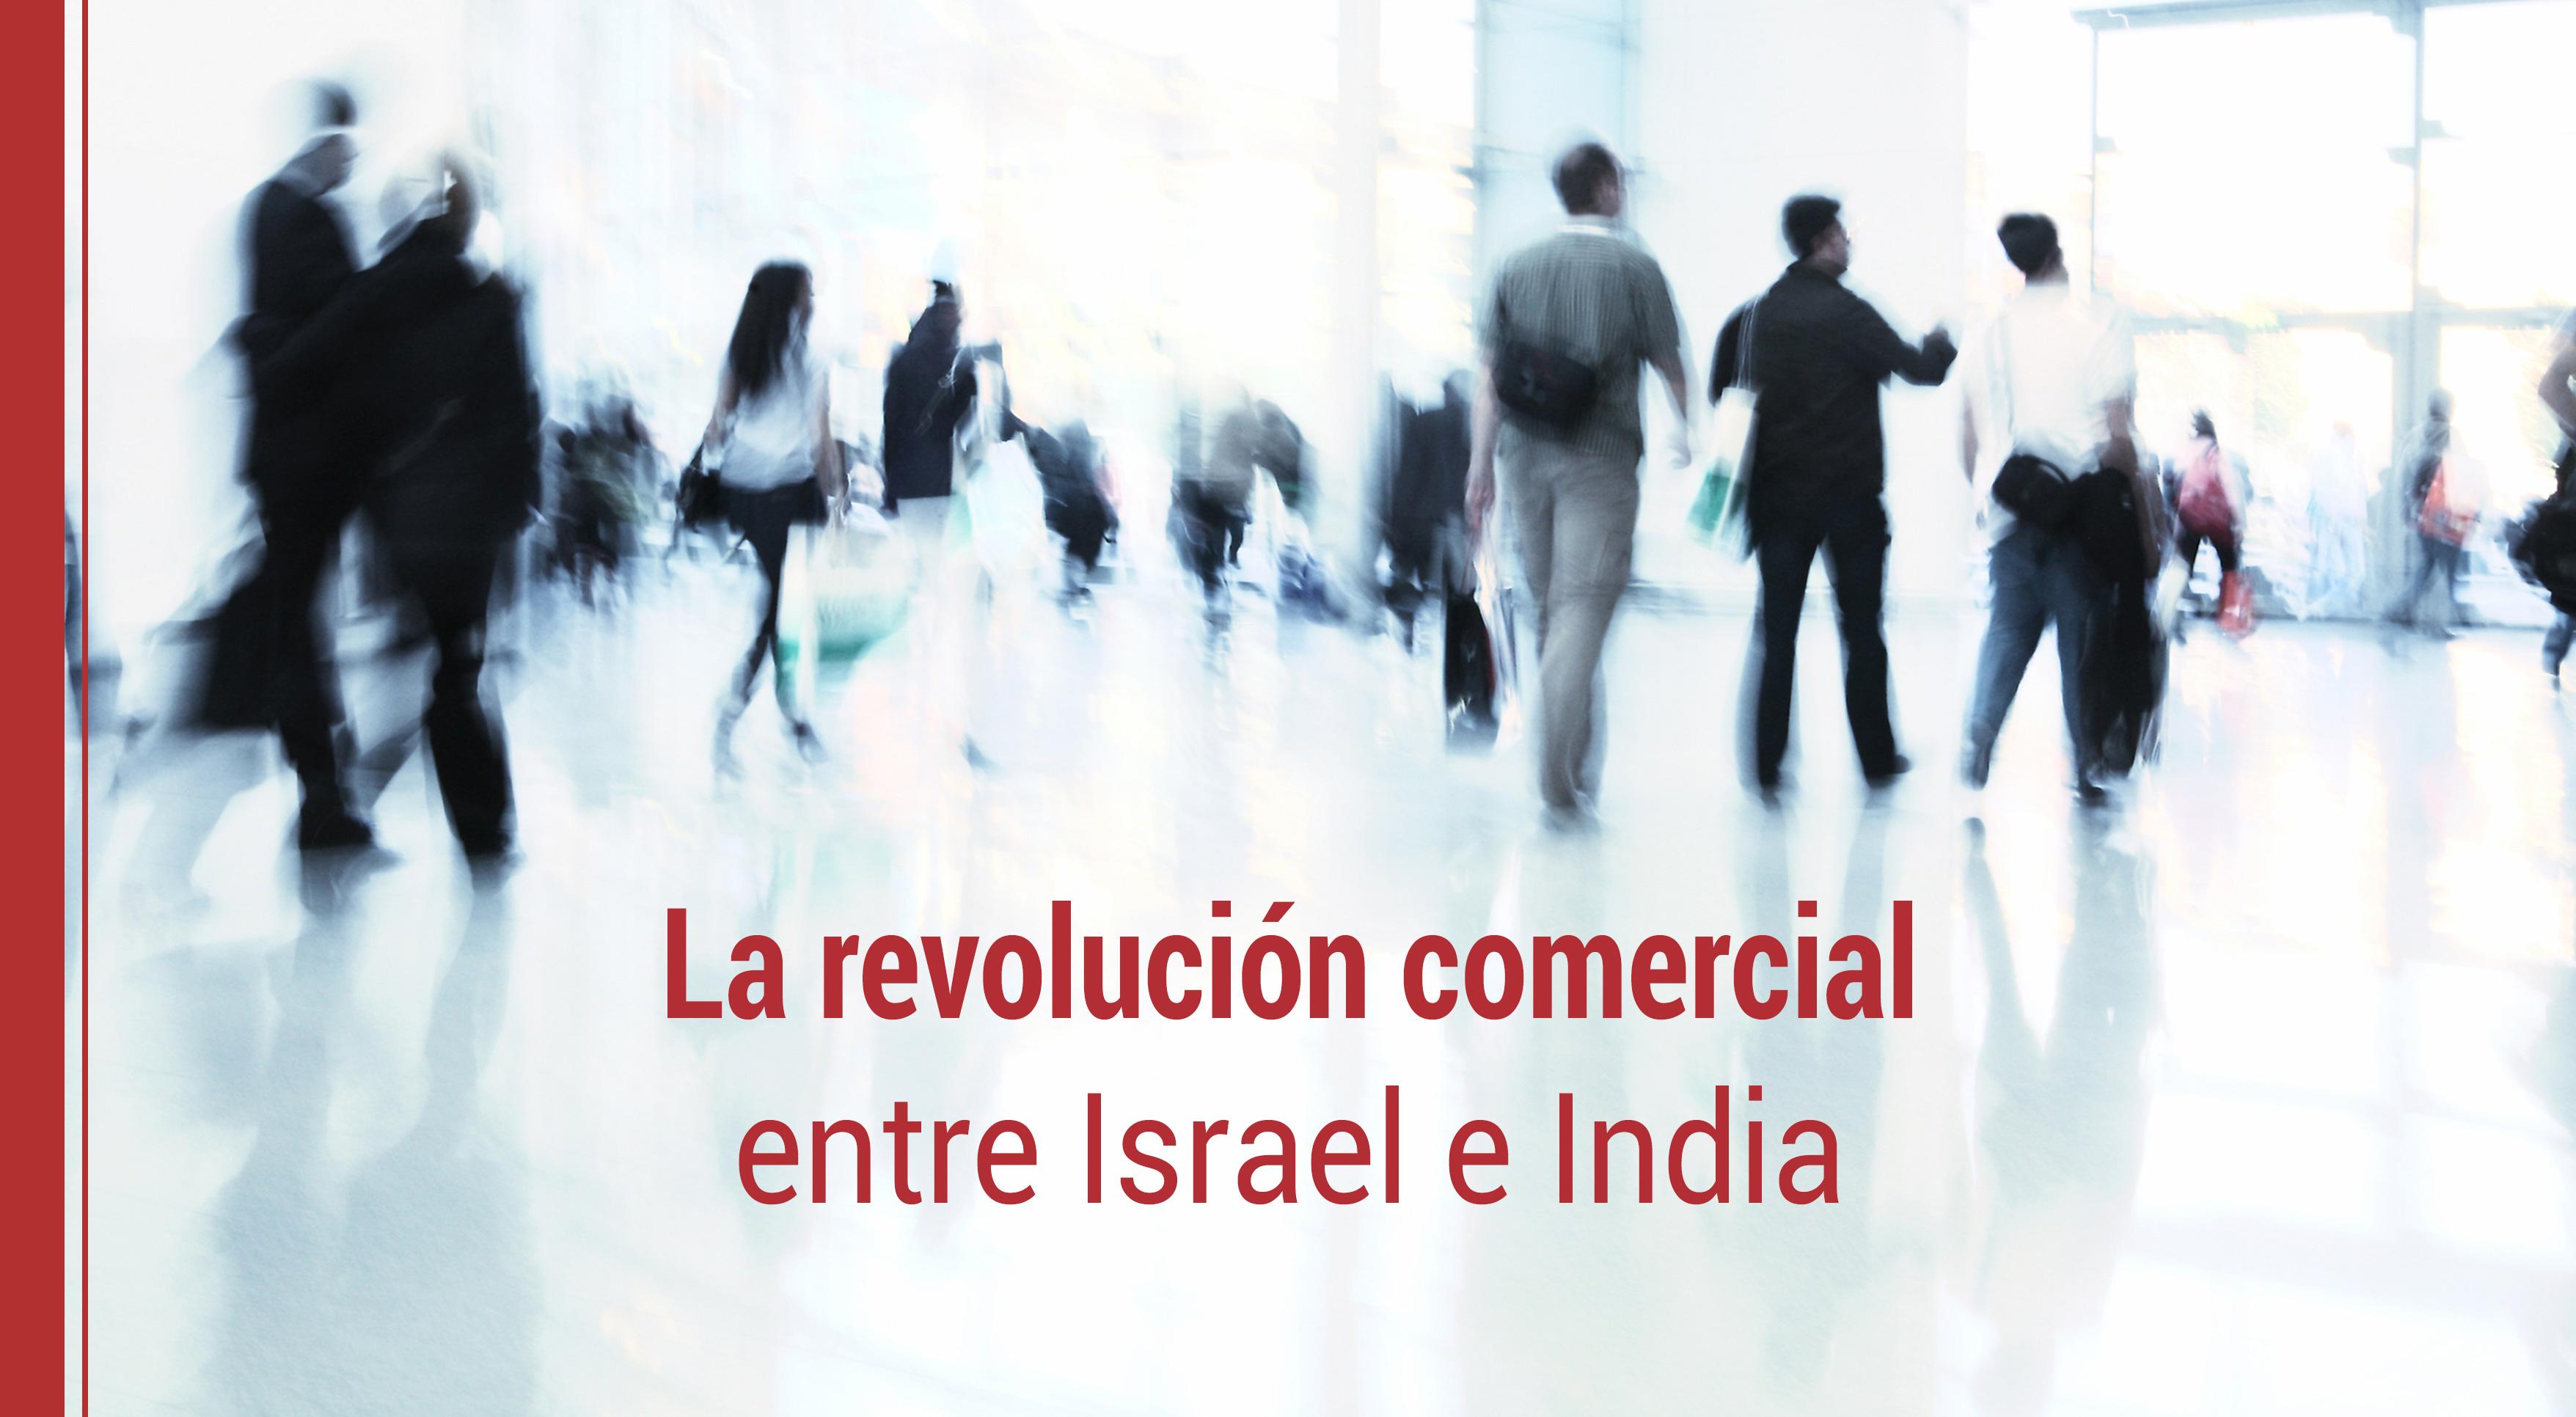 revolucion-comercial-israel-india La revolución comercial entre Israel e India